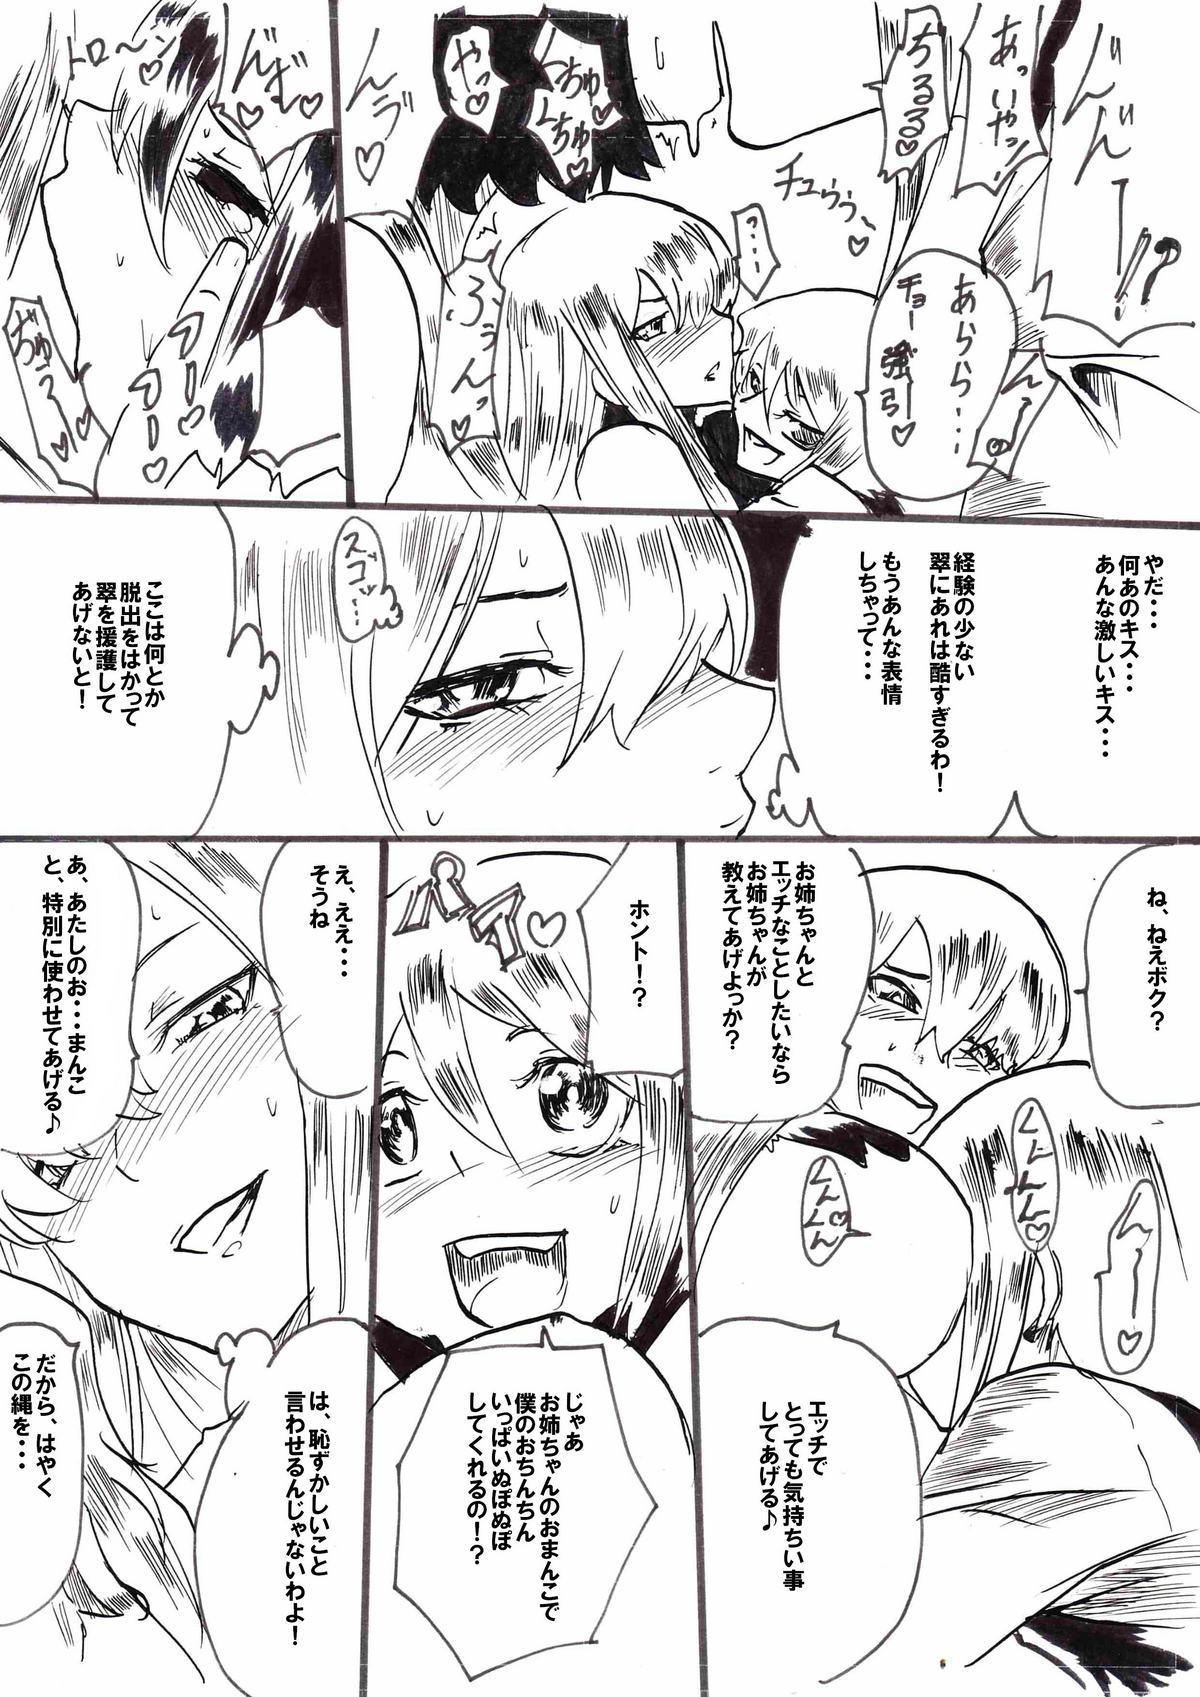 """Taima Doutei Hisui"" Sesshoku Hen Dai San wa 9"